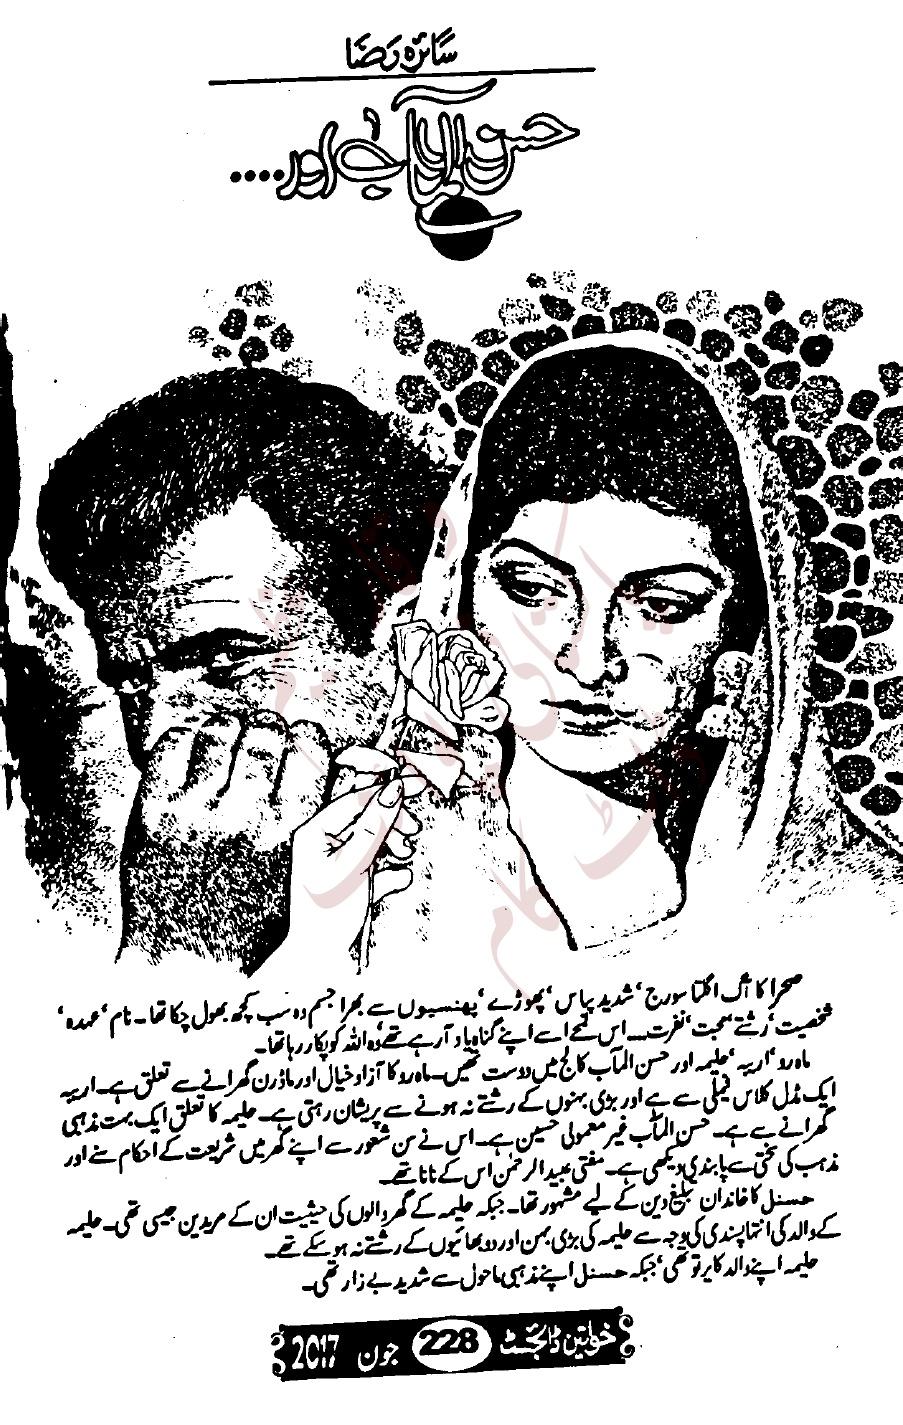 EZ Readings: Hussanal Maab by Saira Raza Epi 6